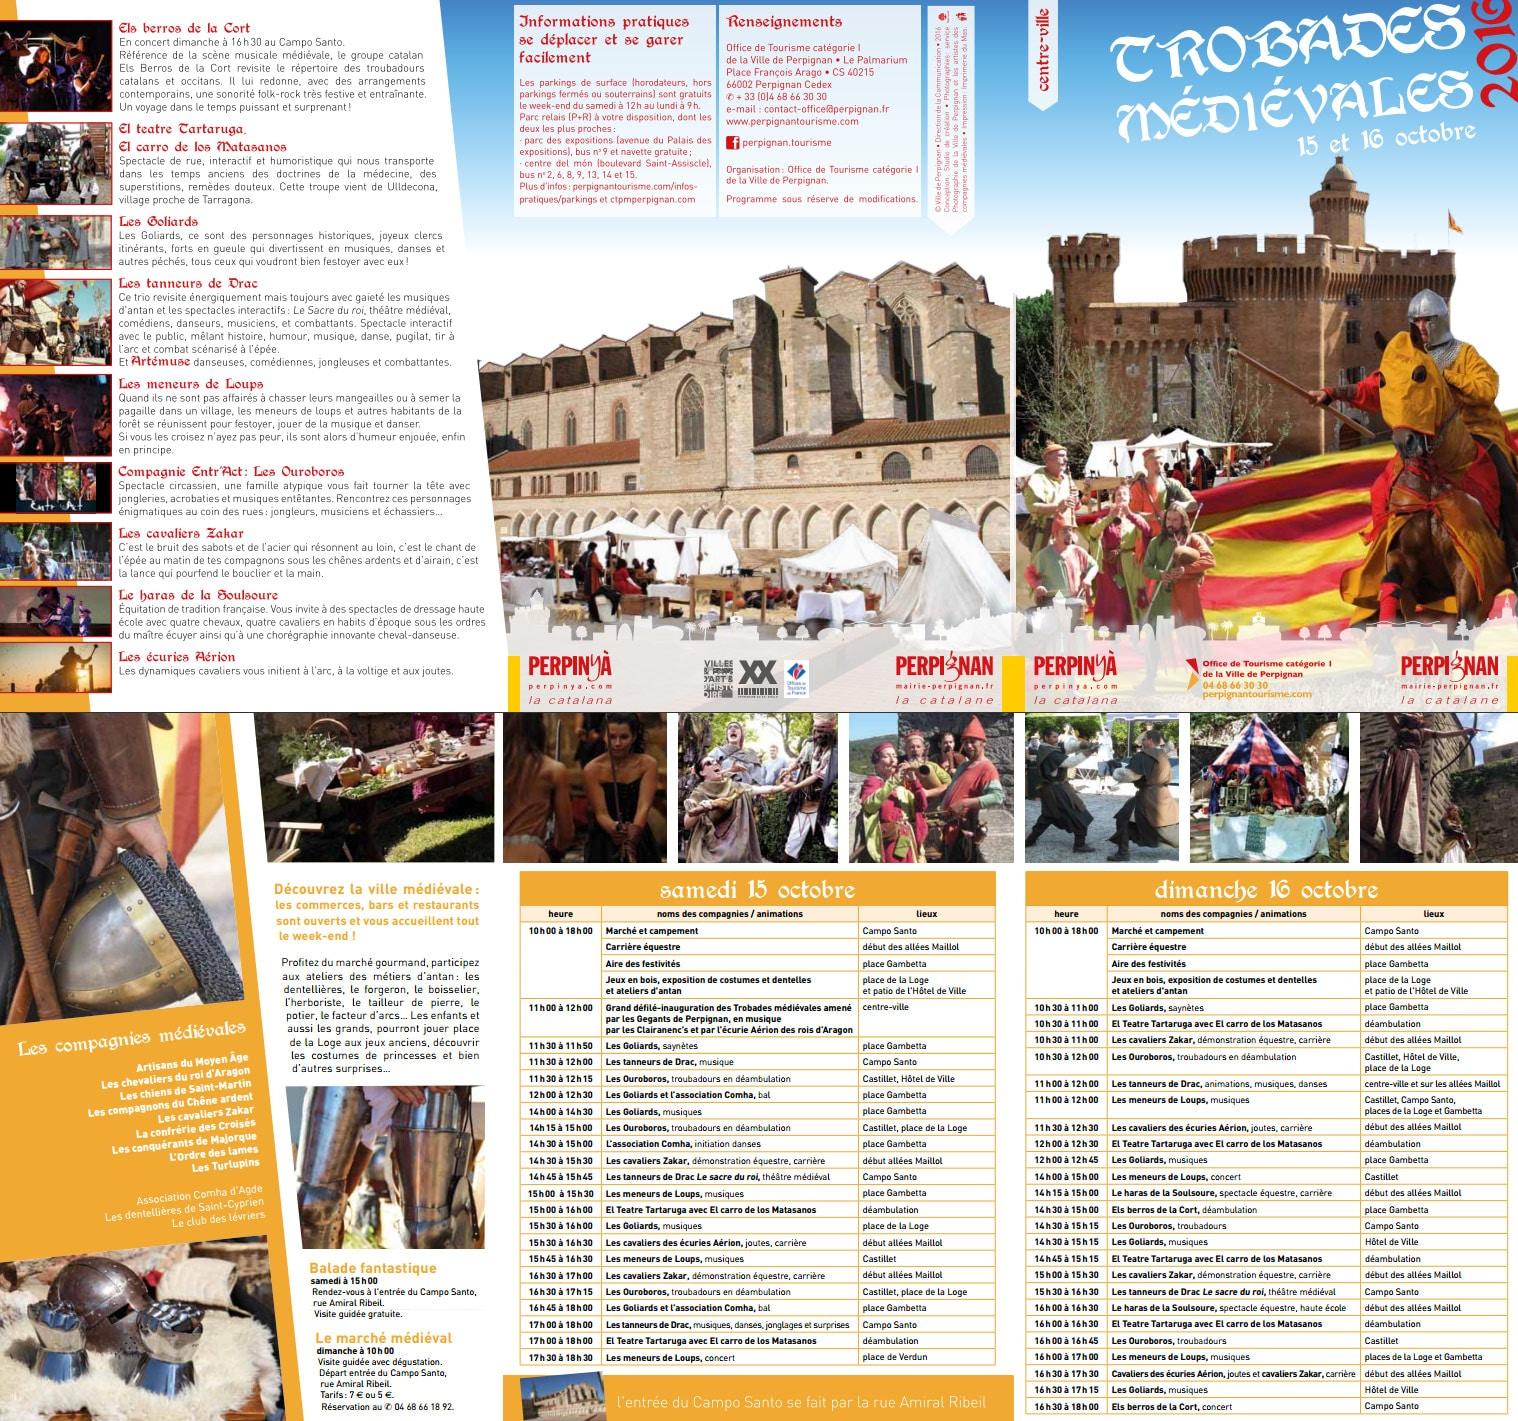 perpignan_la_catalane_troubades_medievales_2016_festival_fetes_moyen-age